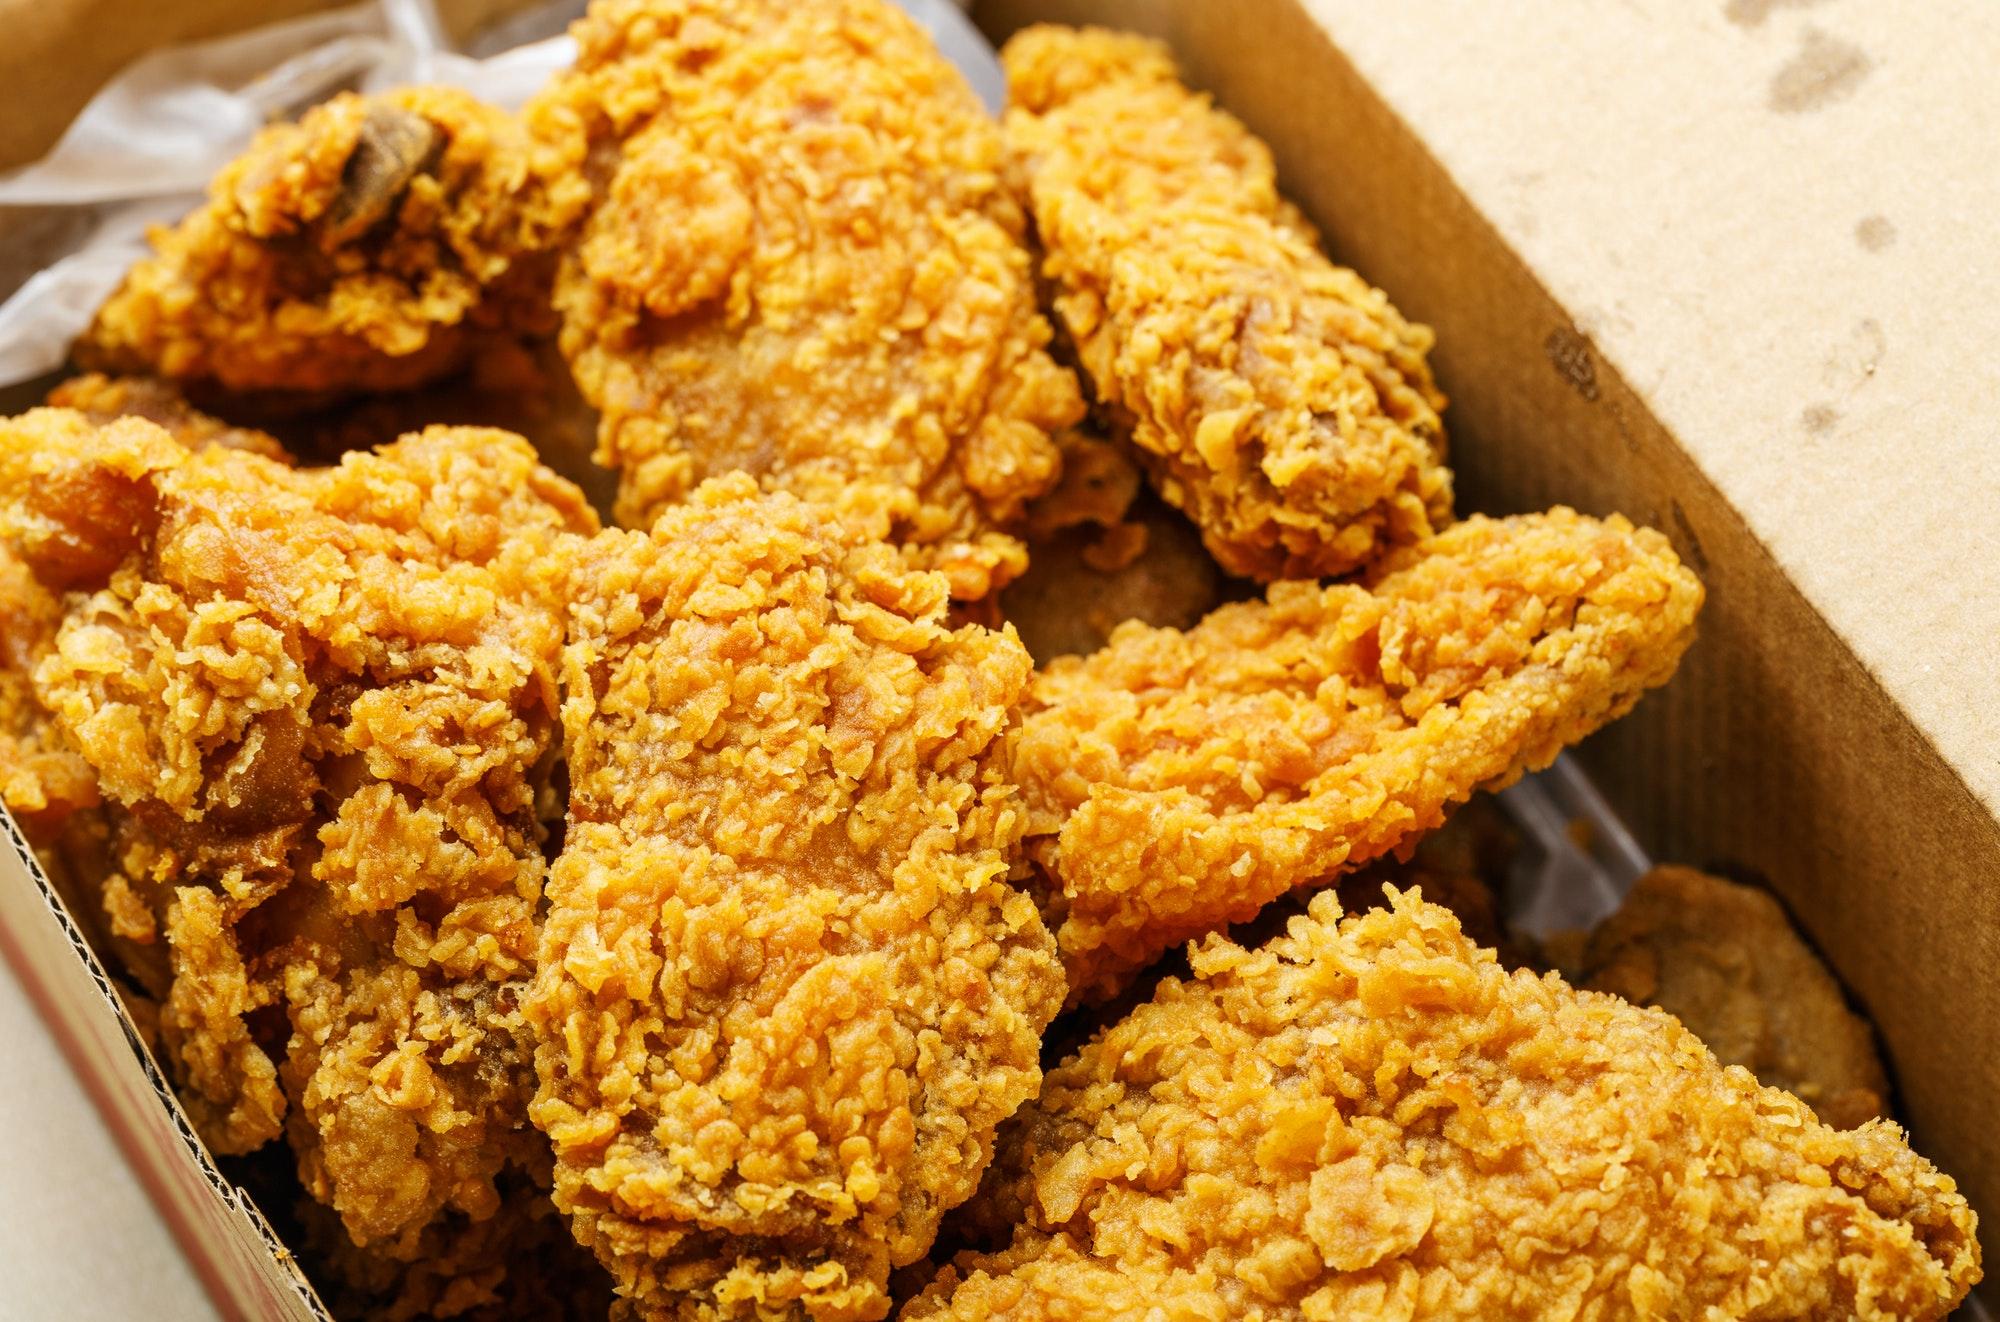 fried food and heart health